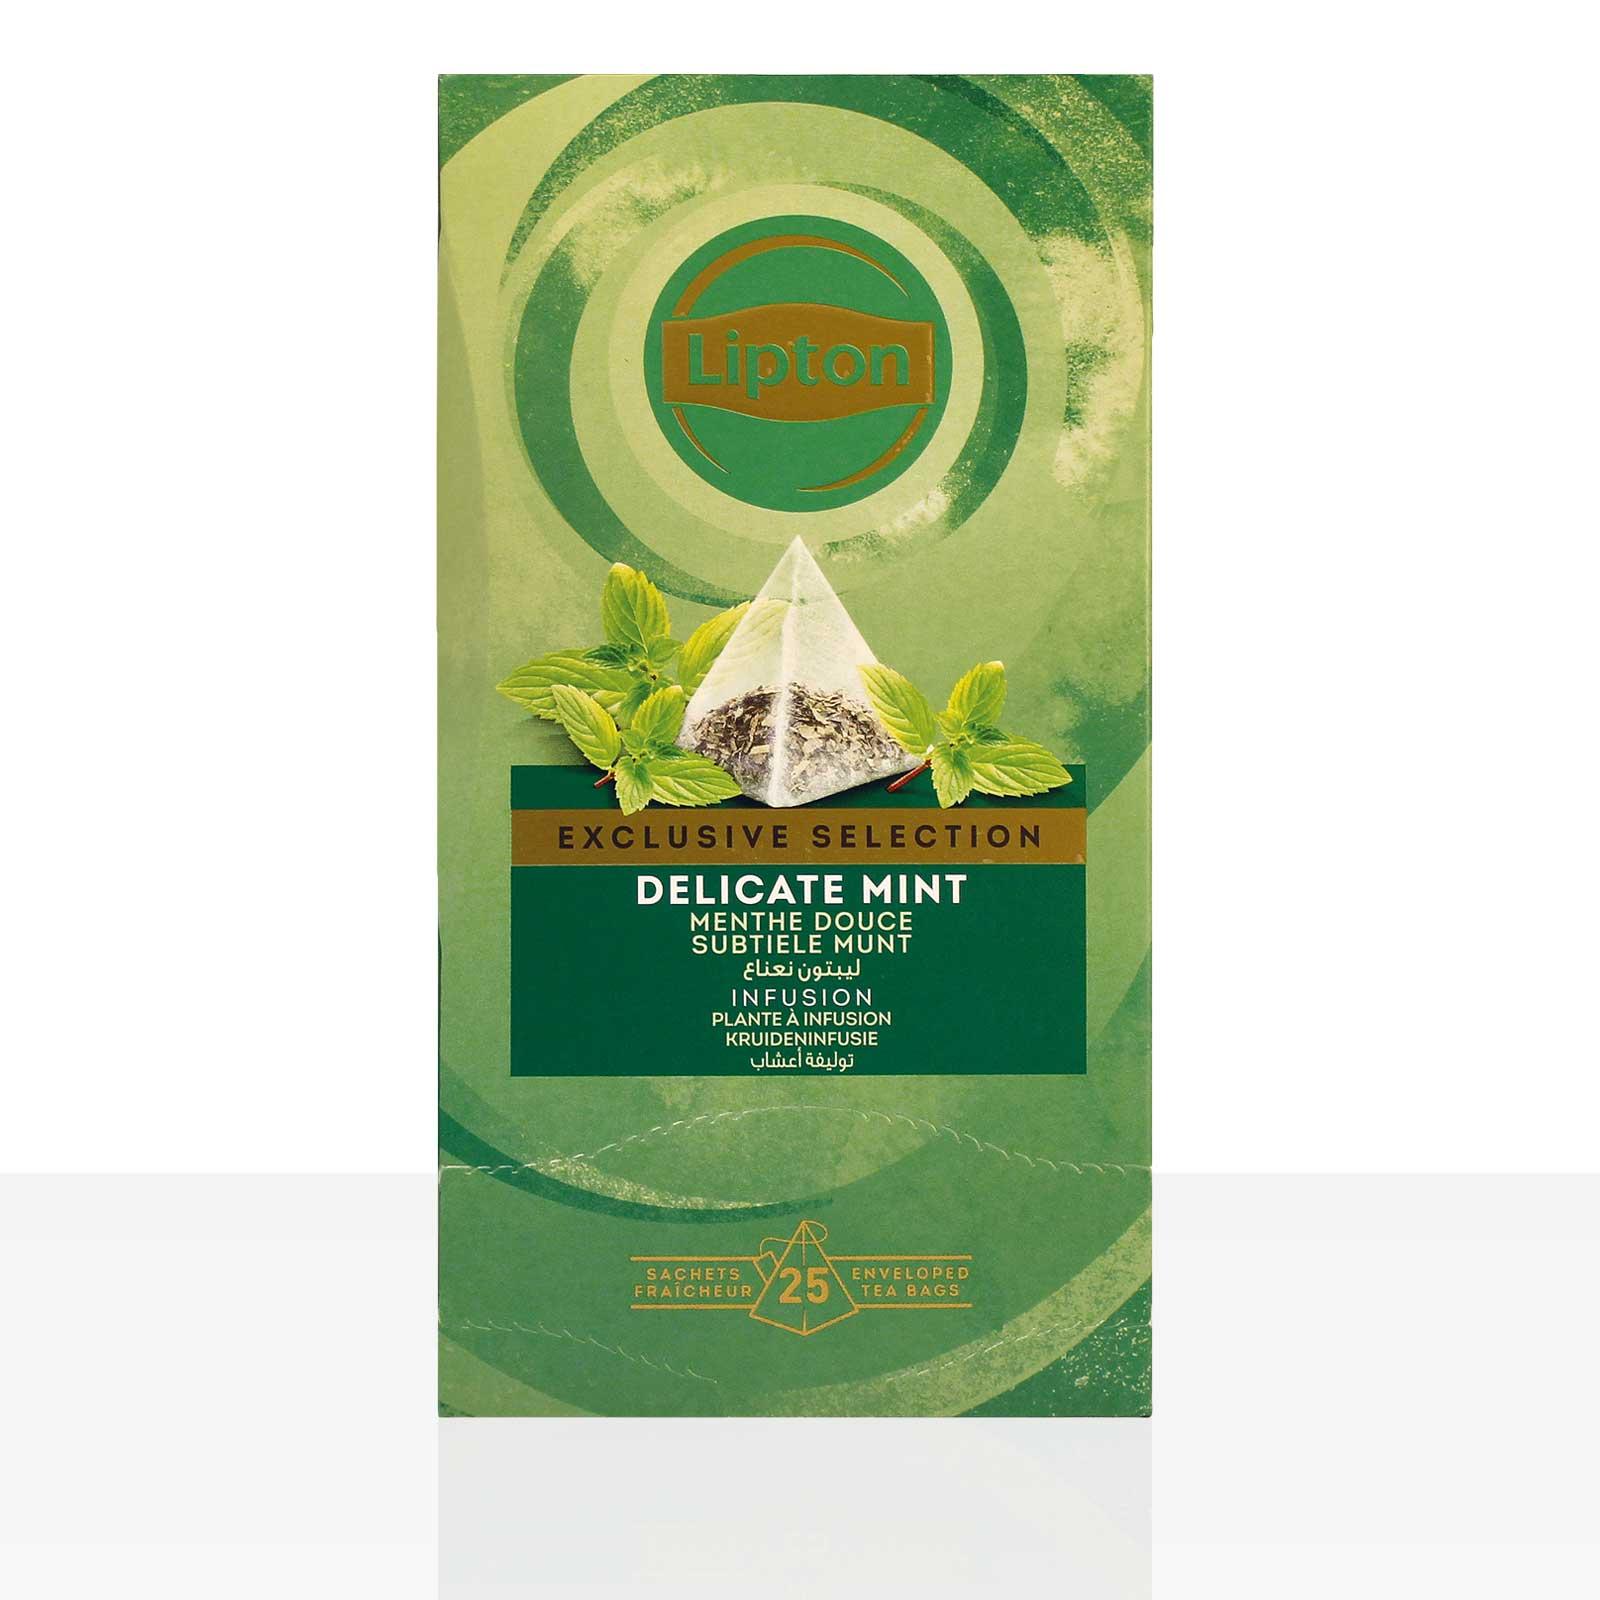 Lipton Tee Exclusive Selection Delicate Mint Pfefferminze 6 x 25 Beutel á 1,1g